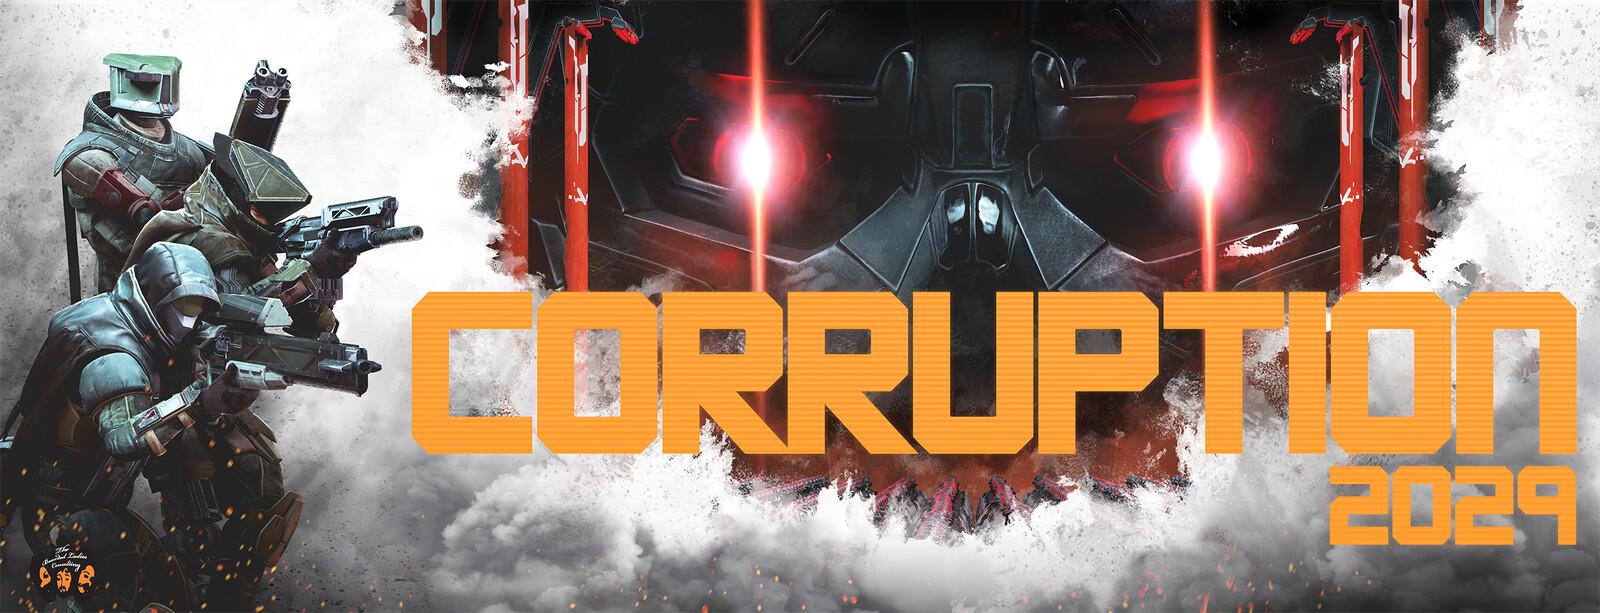 Marketing Art for Corruption 2029